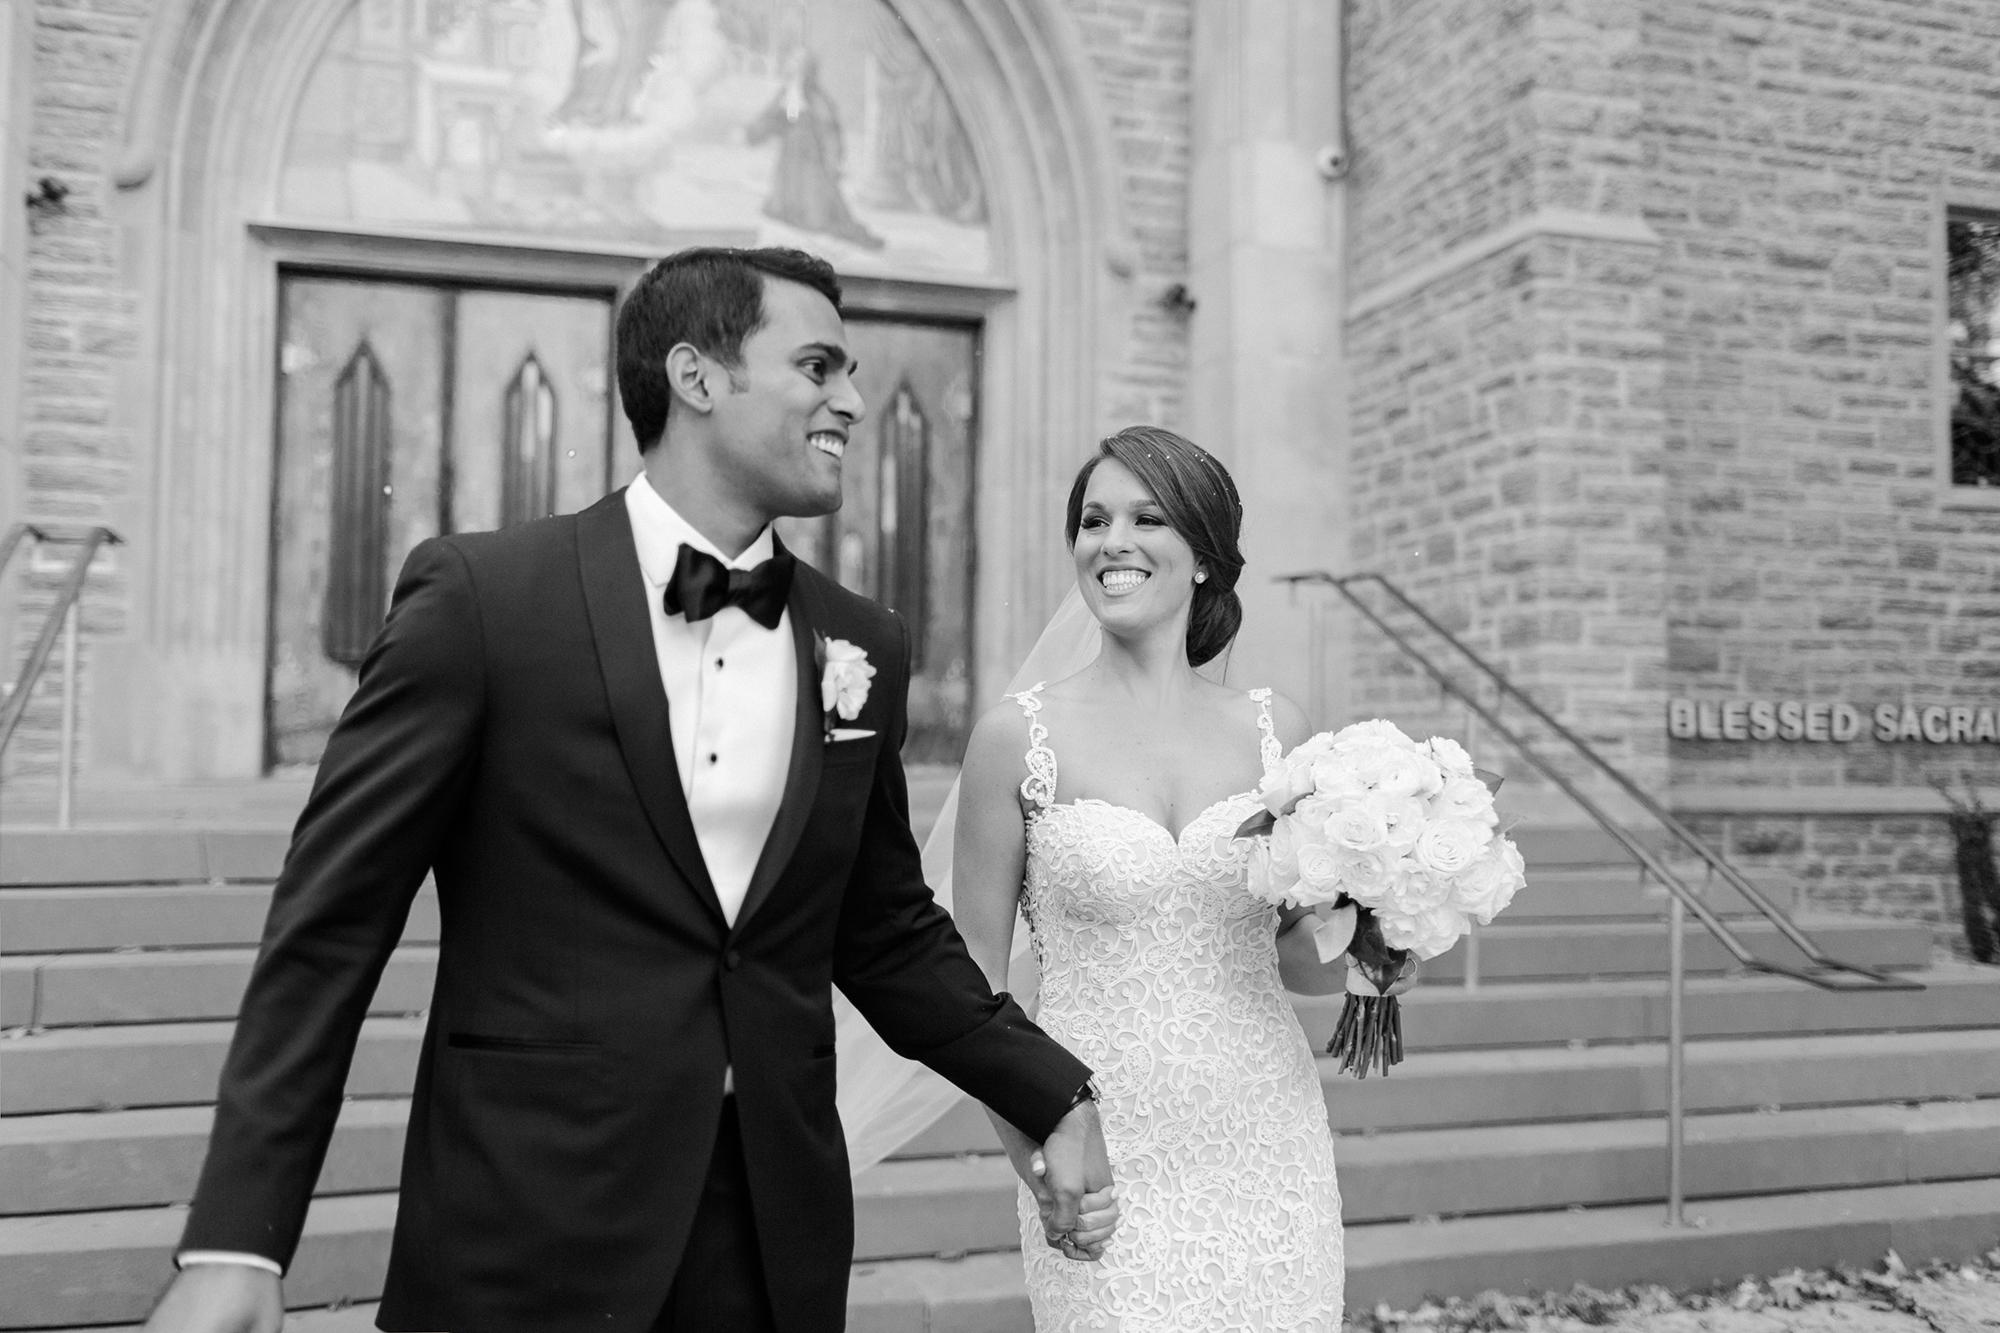 toronto-wedding-photographer-richelle-hunter-leanne-nick-1-2 copy.jpg